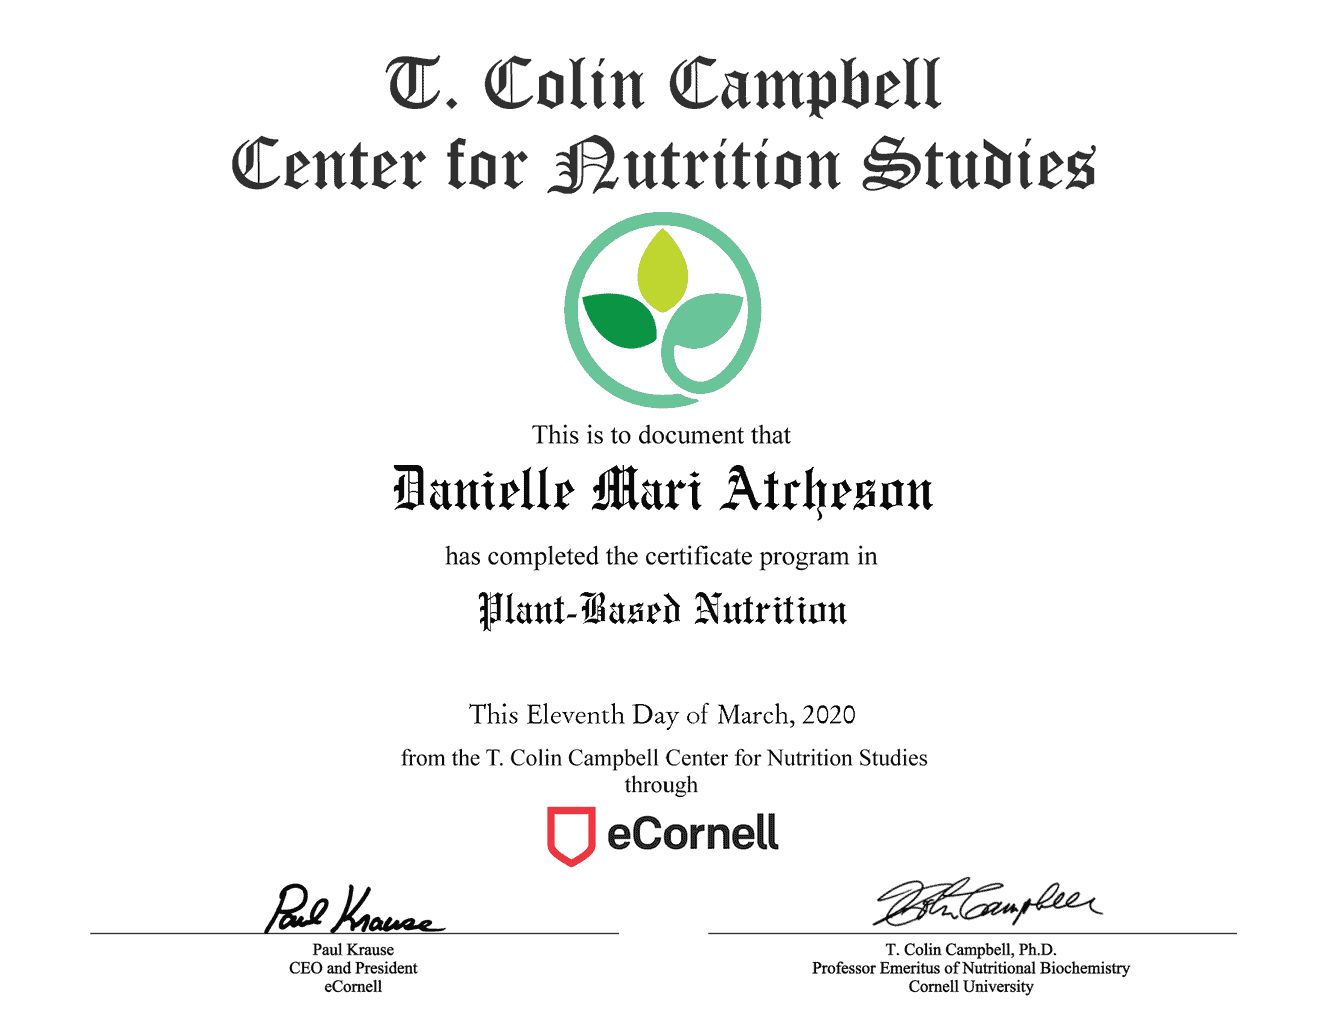 Cornell Plant-Based Nutrition Graduate